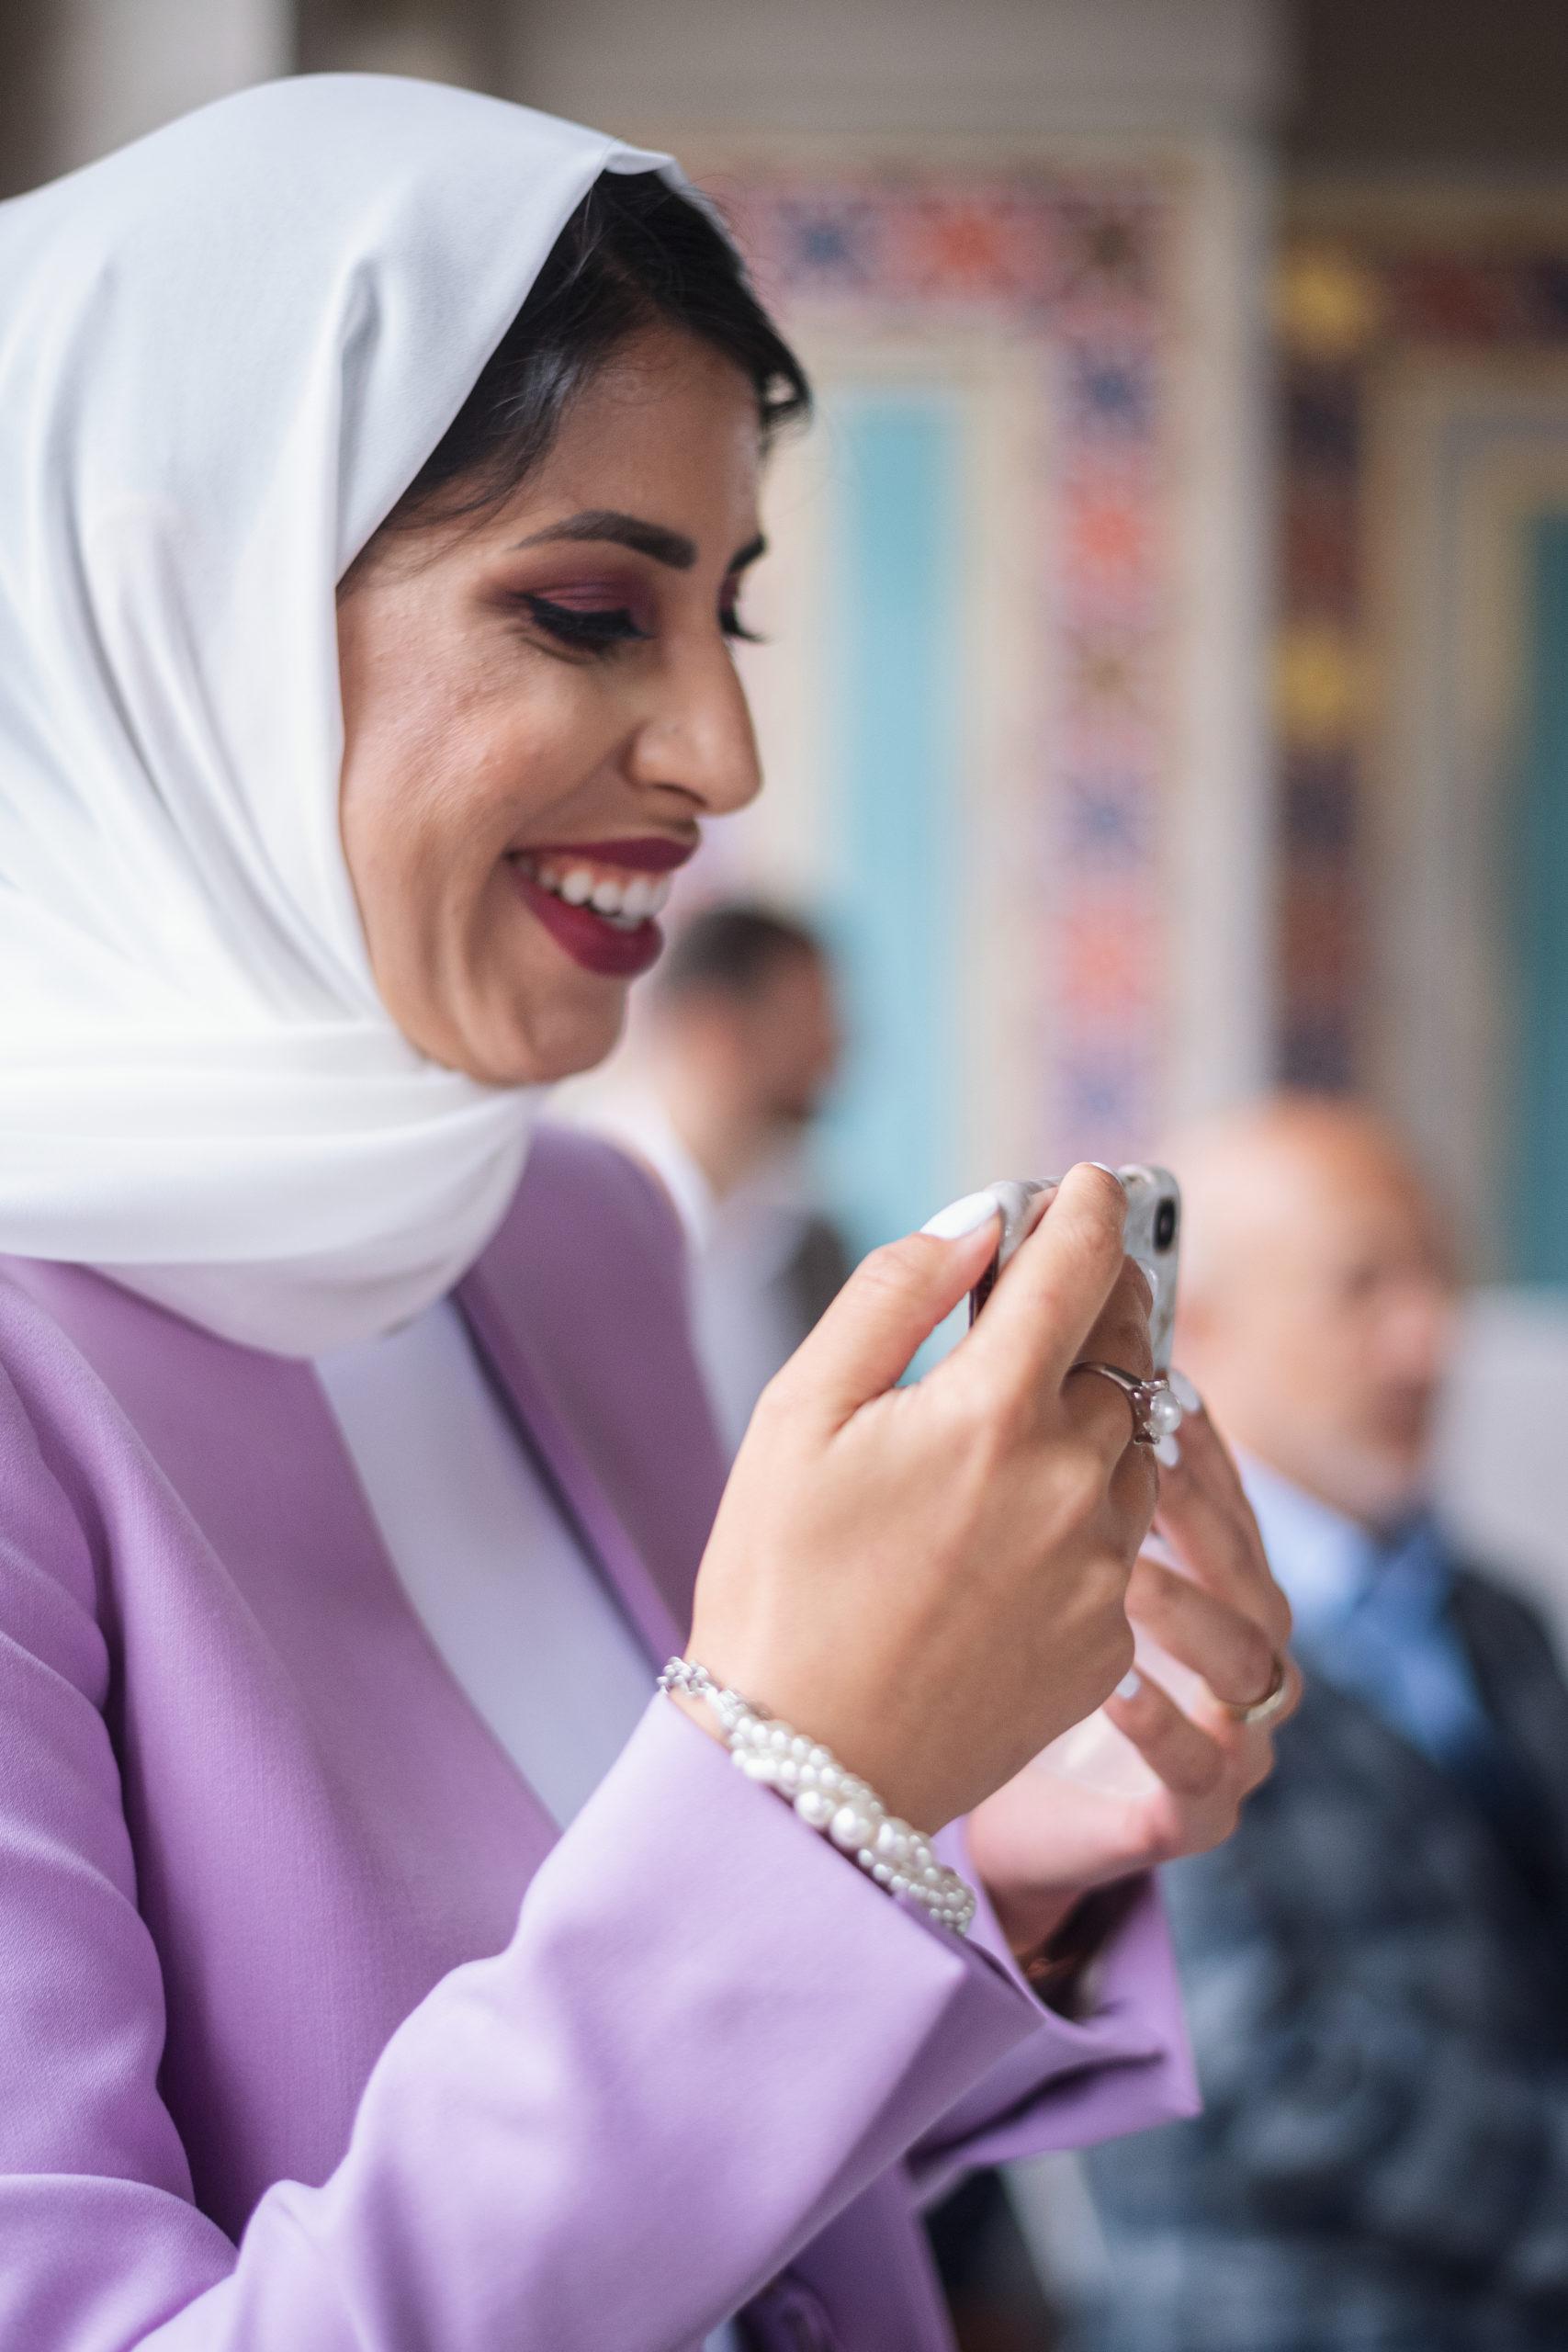 Hochzeitfotografie / Farah & Matin 2020